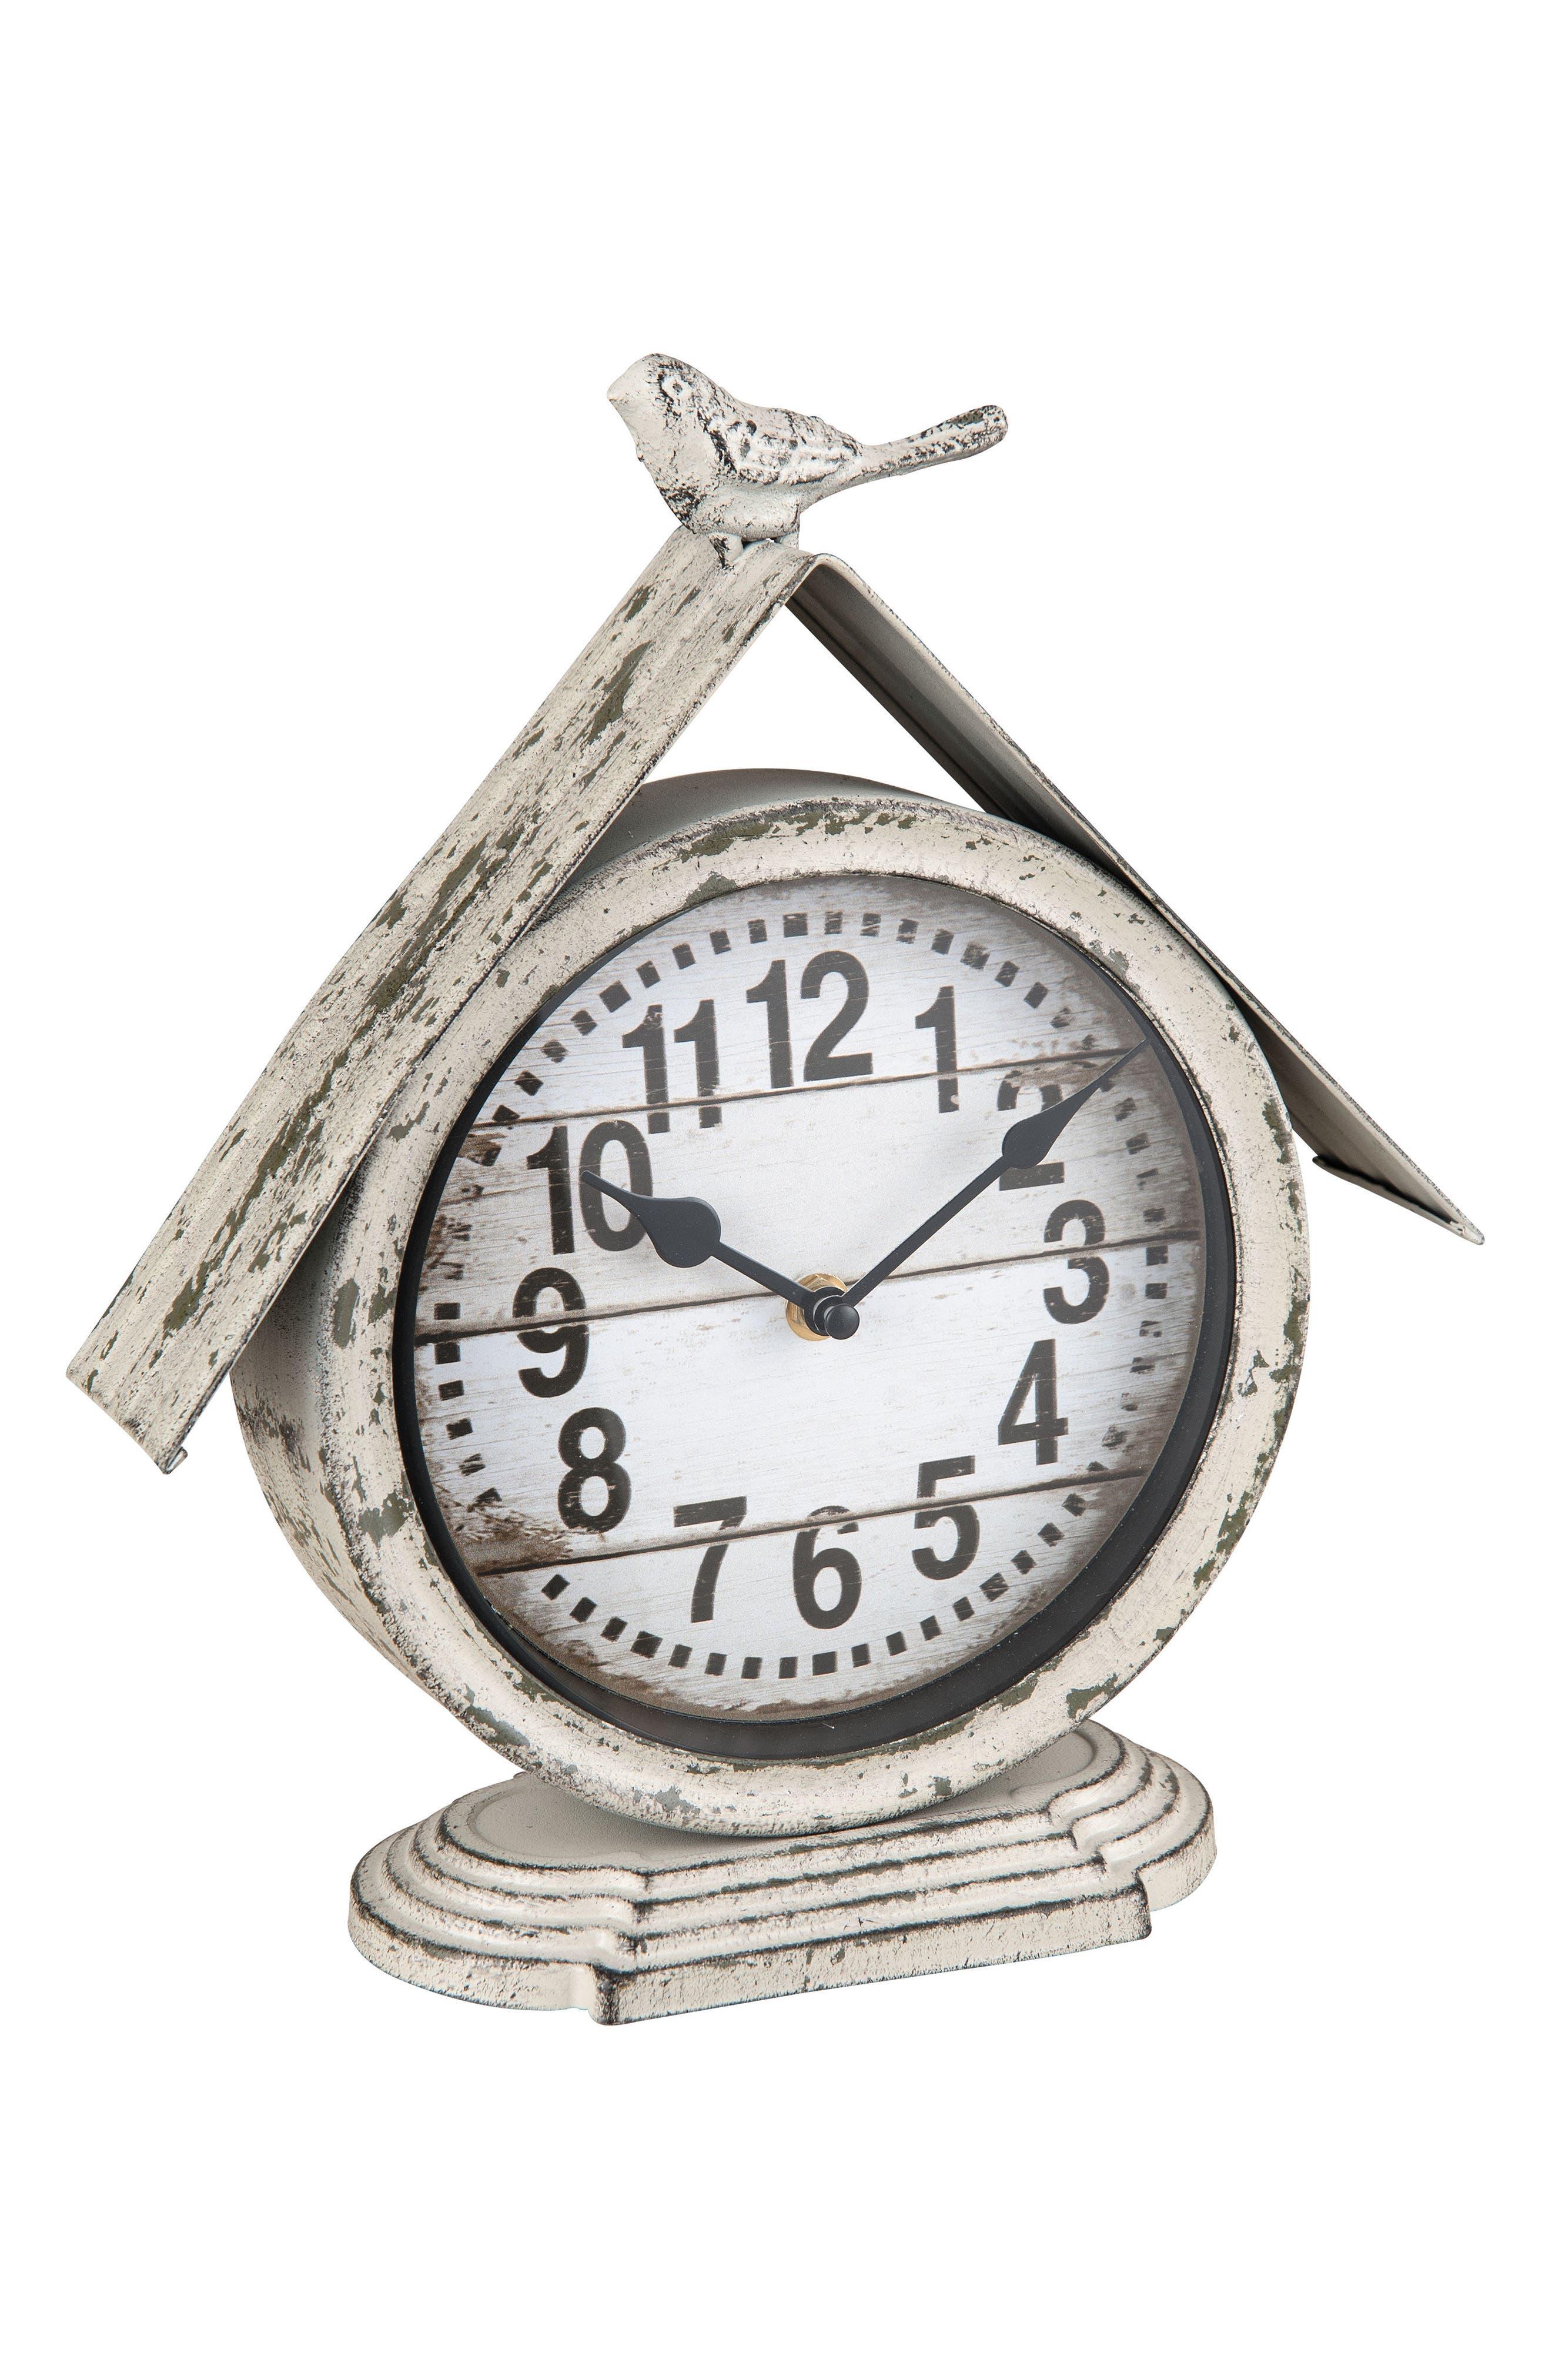 Birdhouse Clock,                             Main thumbnail 1, color,                             Metal/ Glass